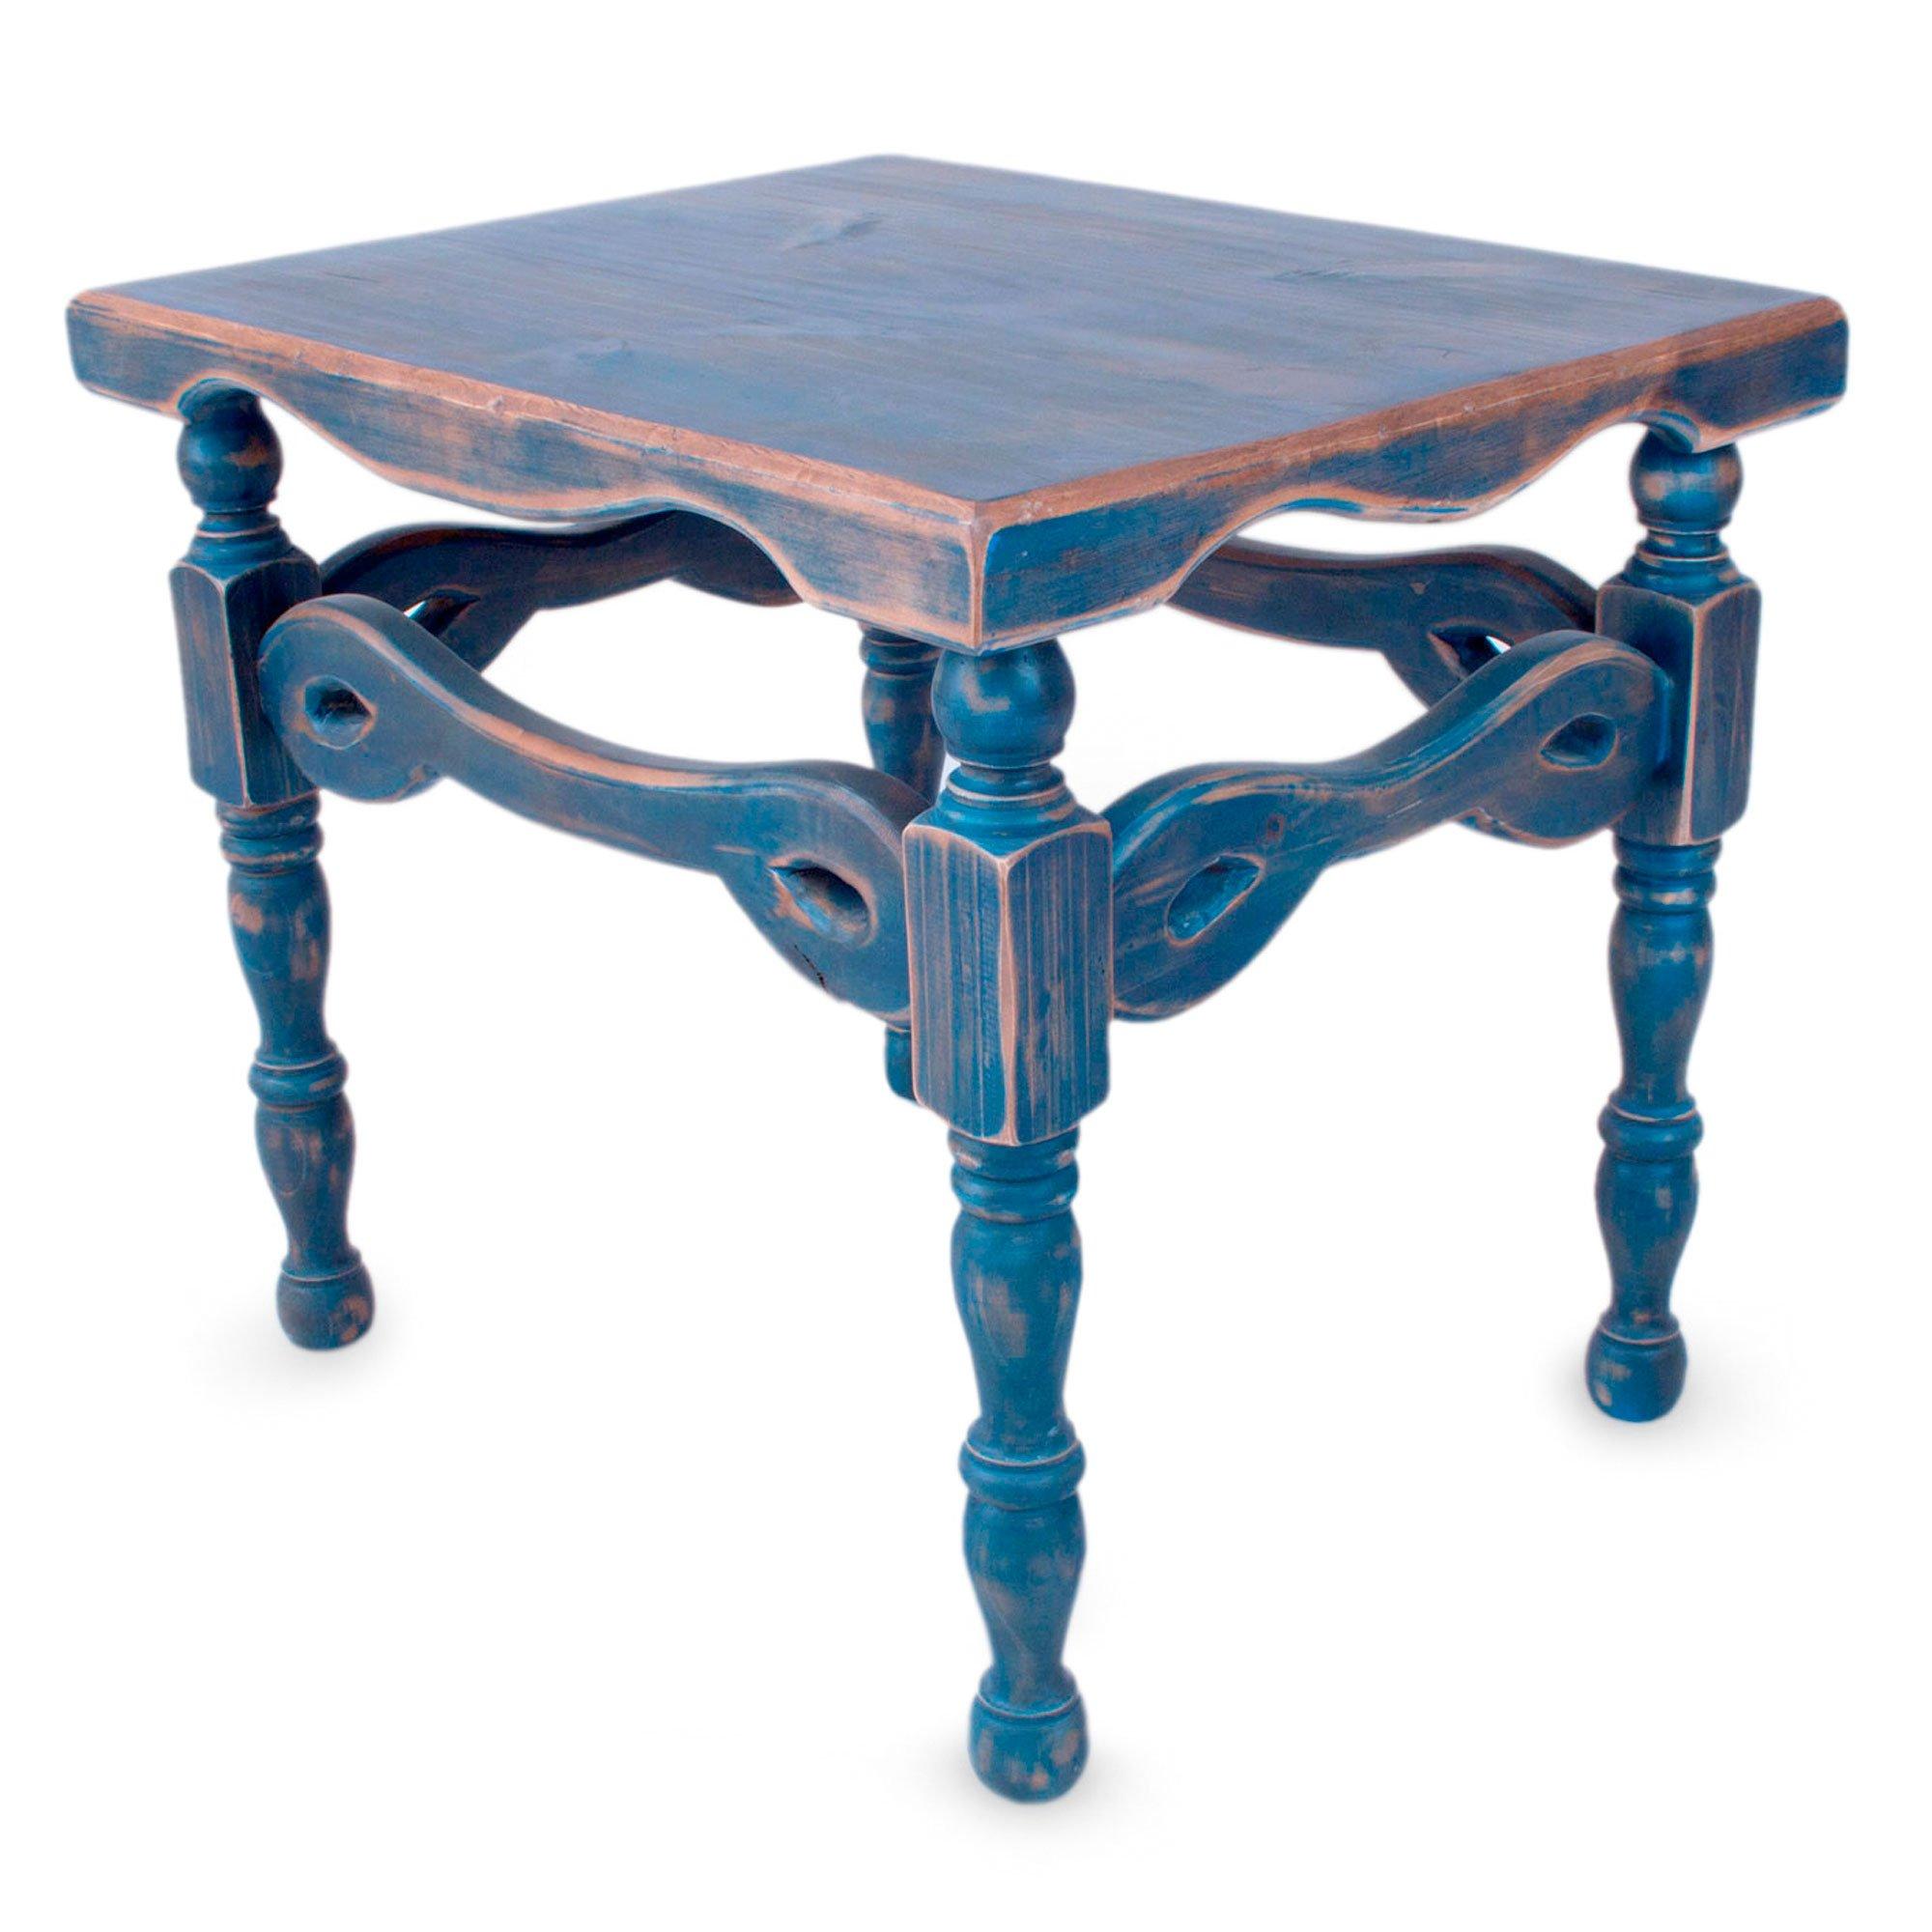 NOVICA Pinewood Rustic End Tables, 23.5'' Tall, Blue, 'Hidalgo Royal Blue' by NOVICA (Image #1)